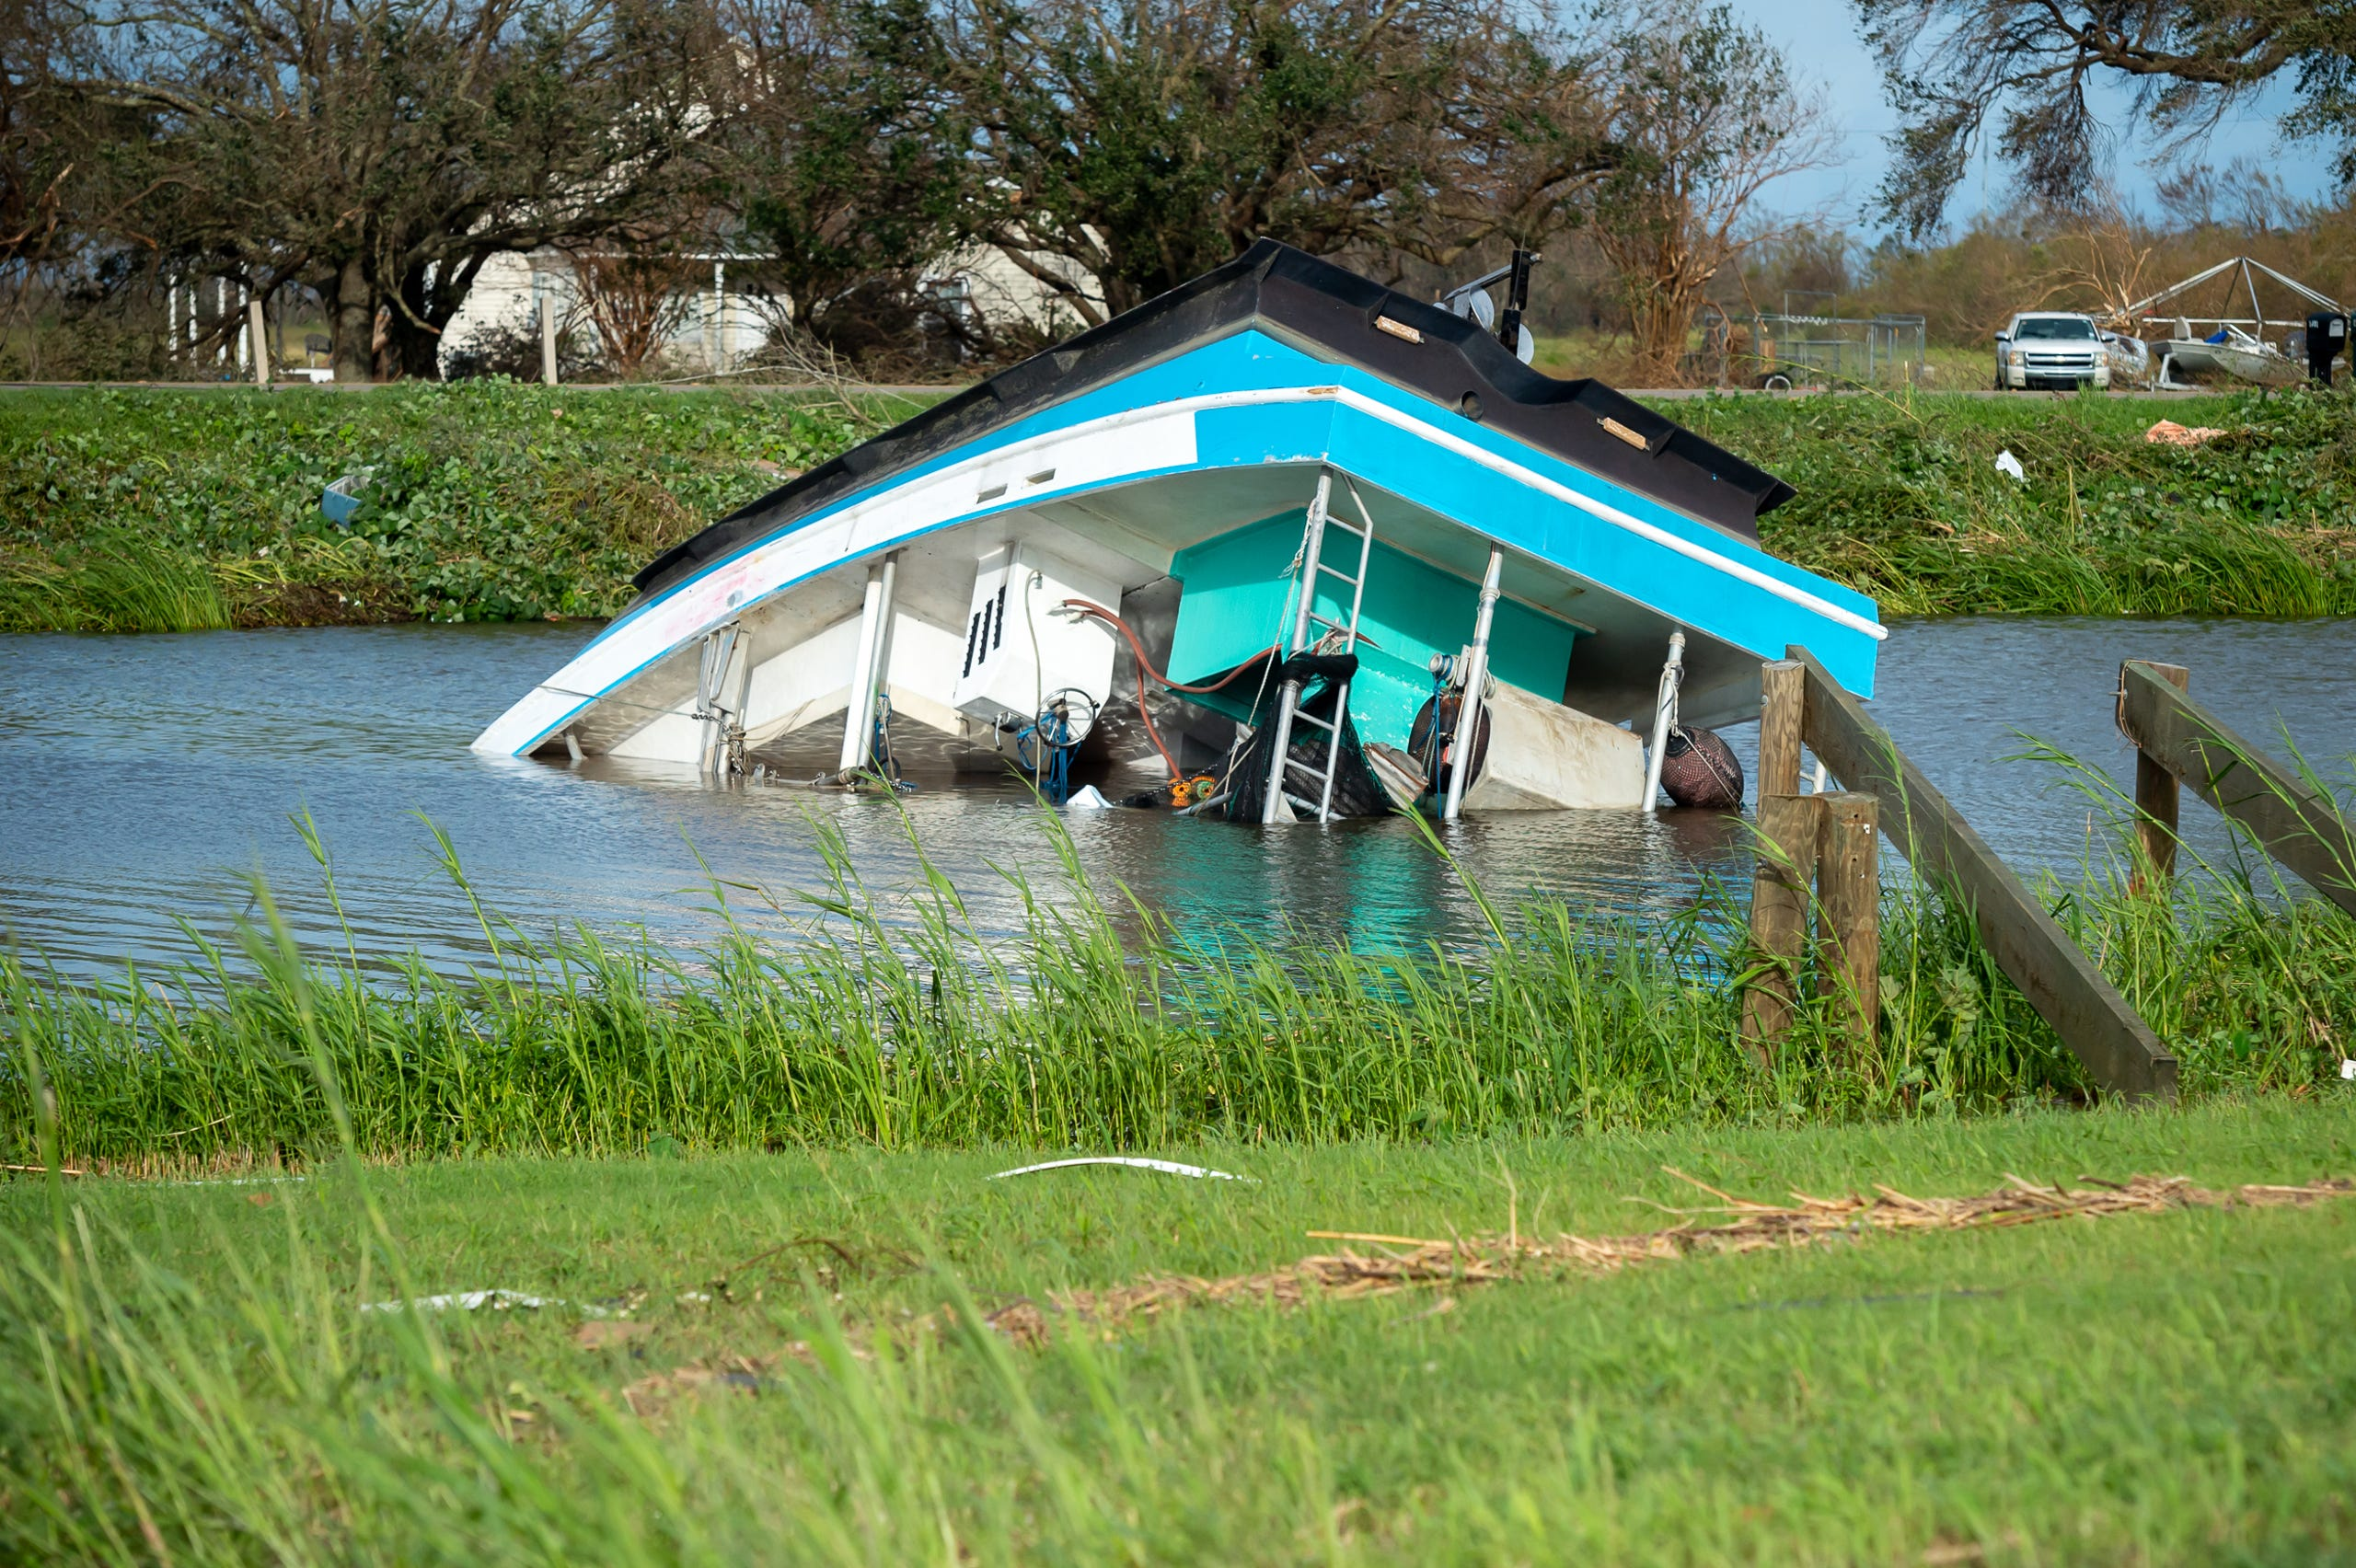 Hurricane Ida leaves destruction behind near Golden Meadow, LA. Monday, Aug. 30, 2021.